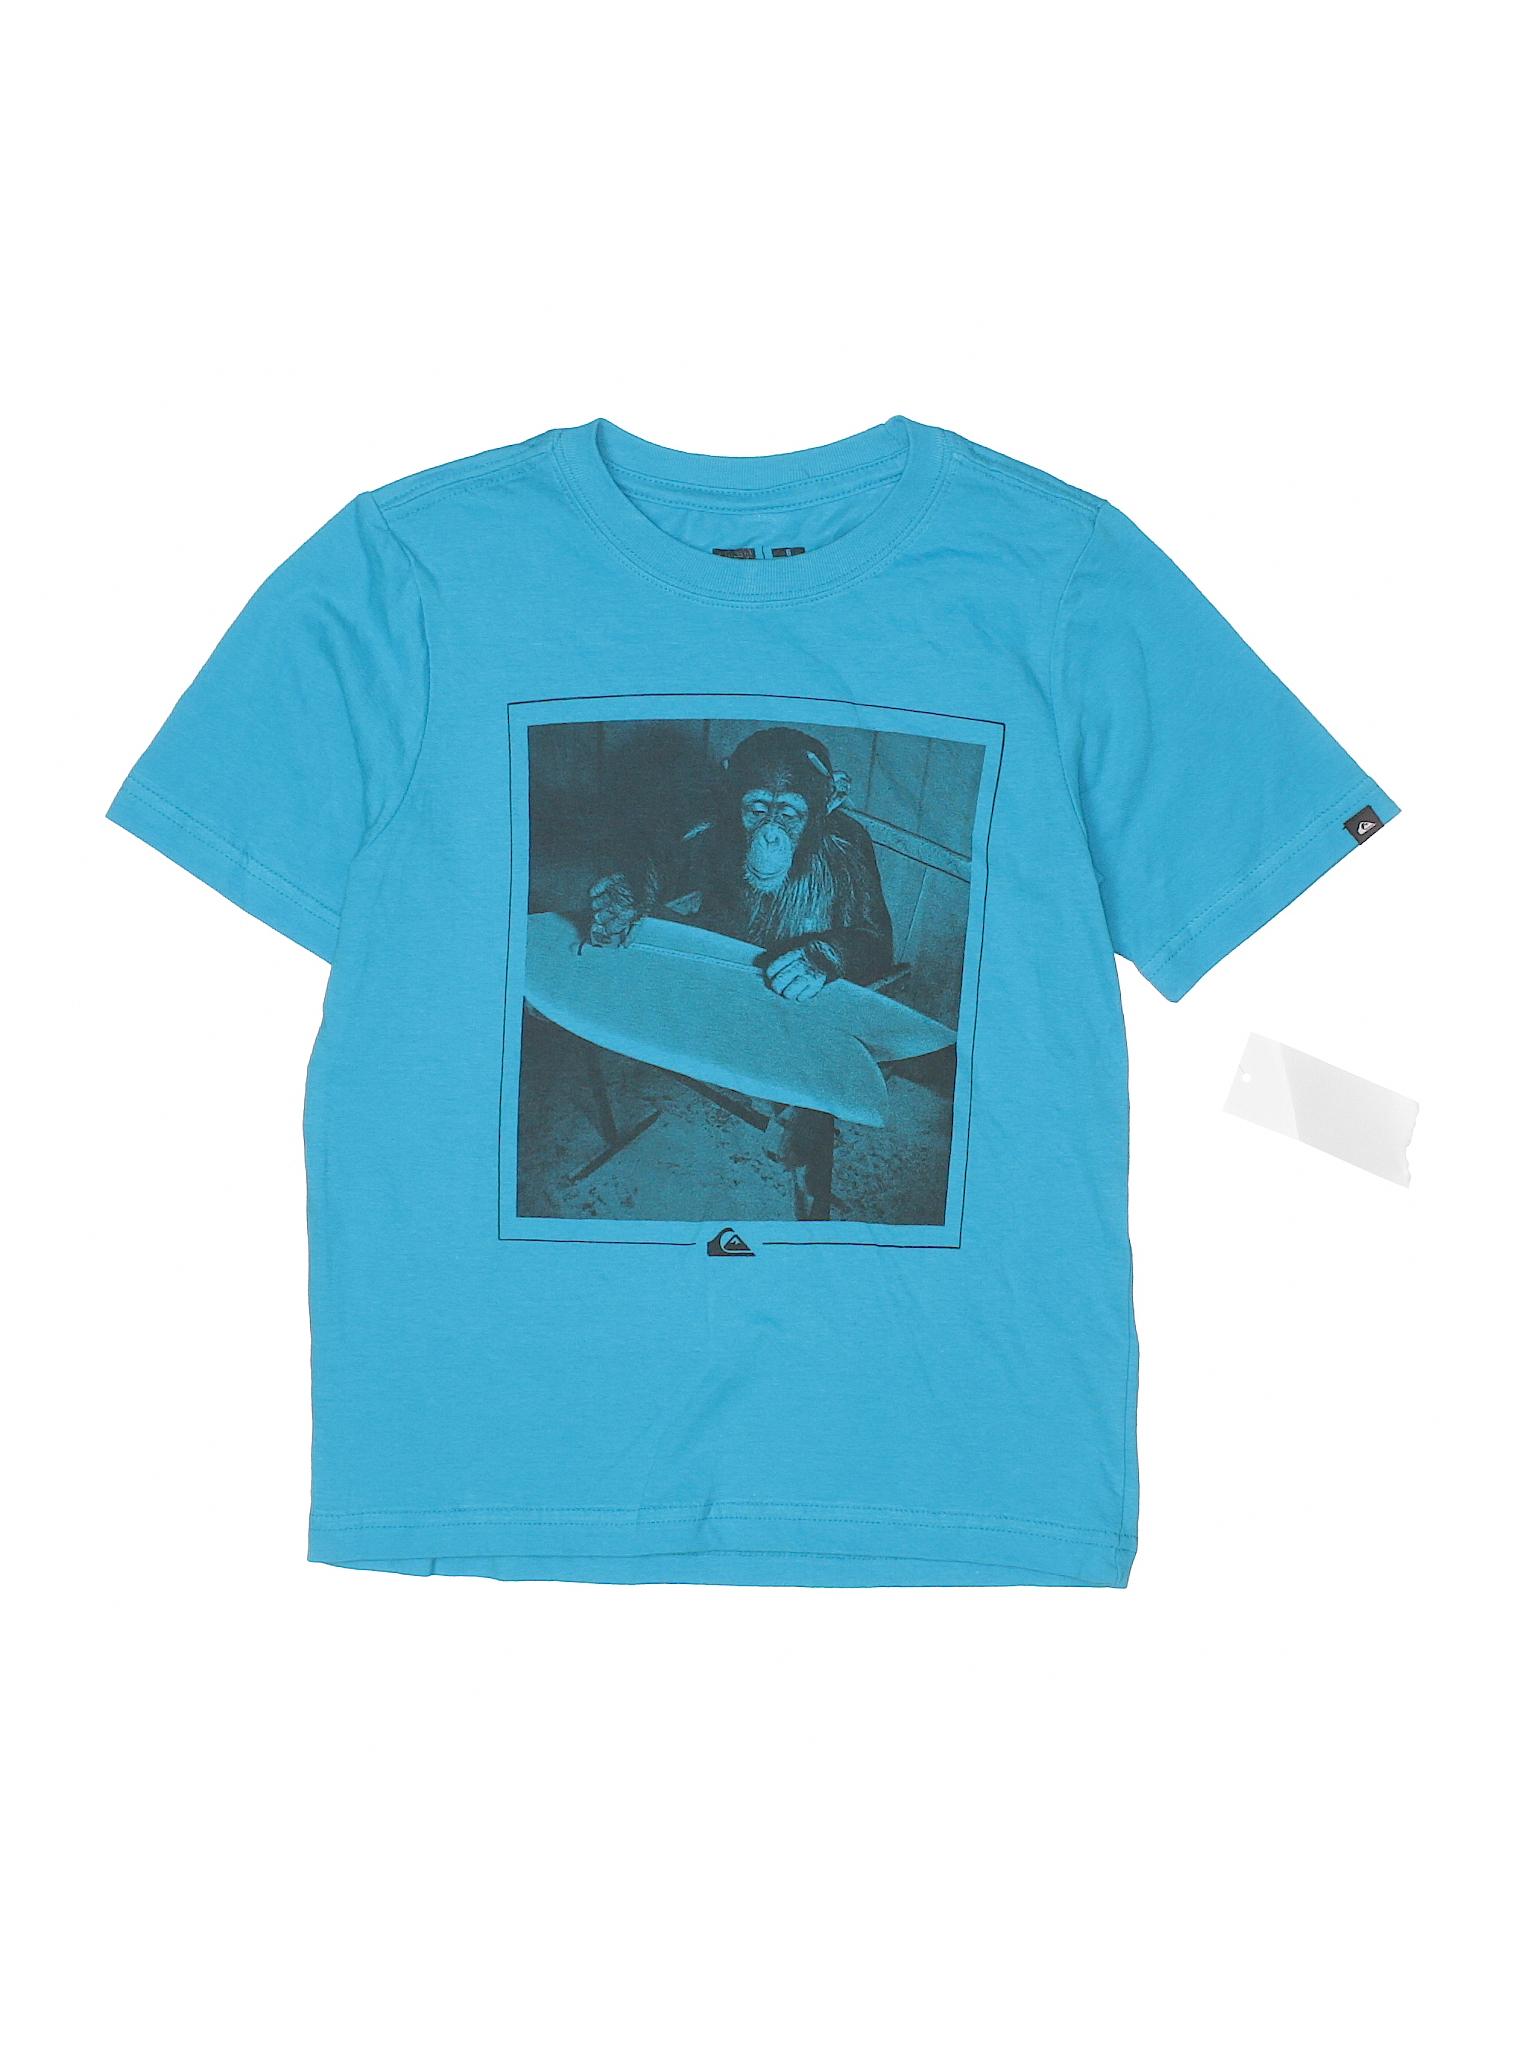 Quiksilver short sleeve t shirt 20 off only on thredup for Bureau quiksilver